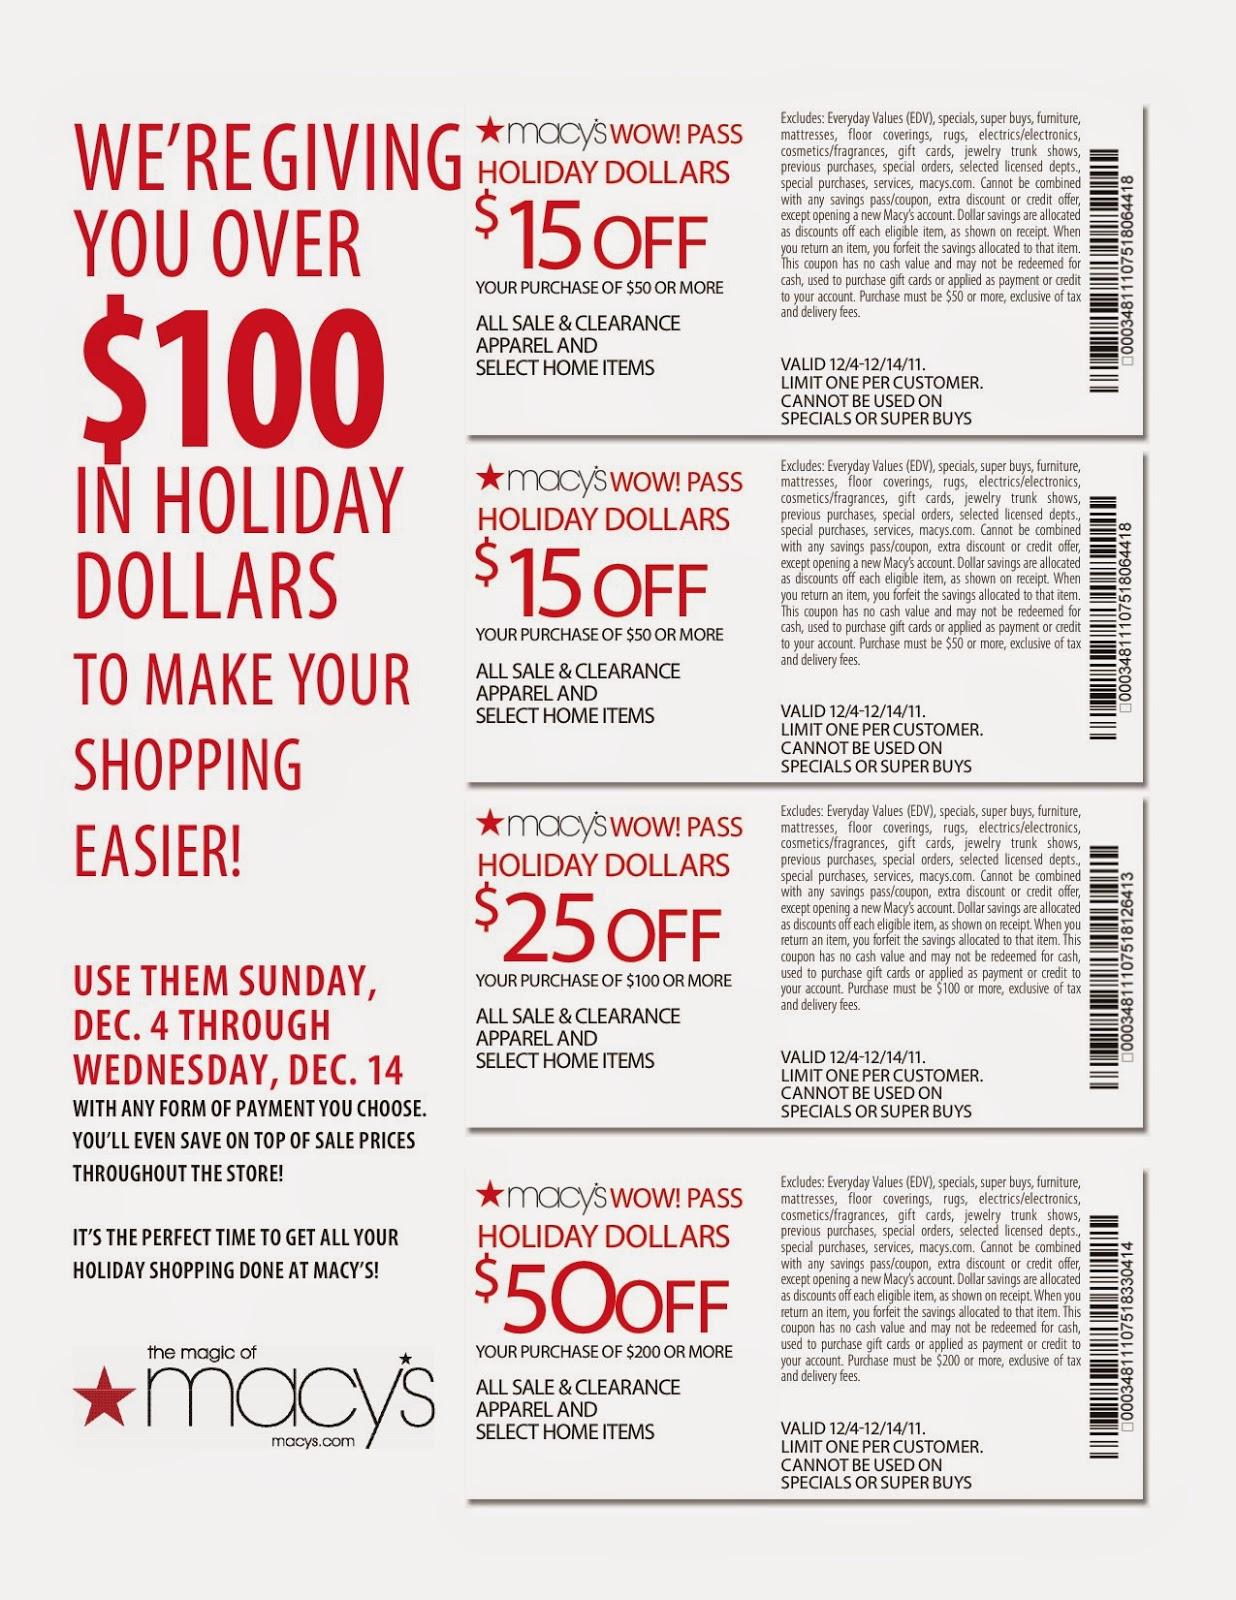 Macys printable coupons for perfume / Lowes dewalt miter saw coupon